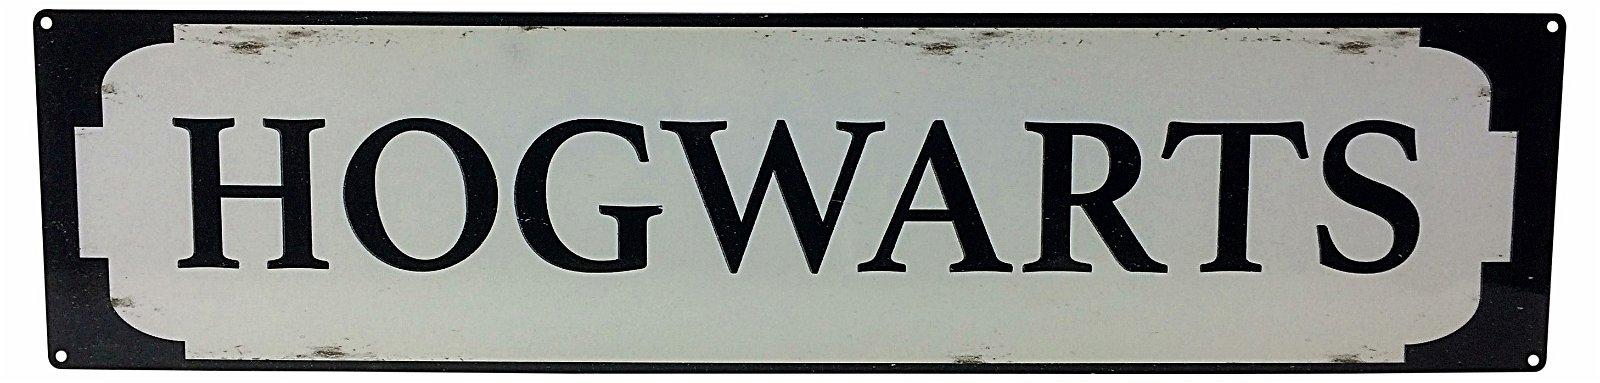 M4600Metal Street Sign HOGWARTS 70cm x17cm